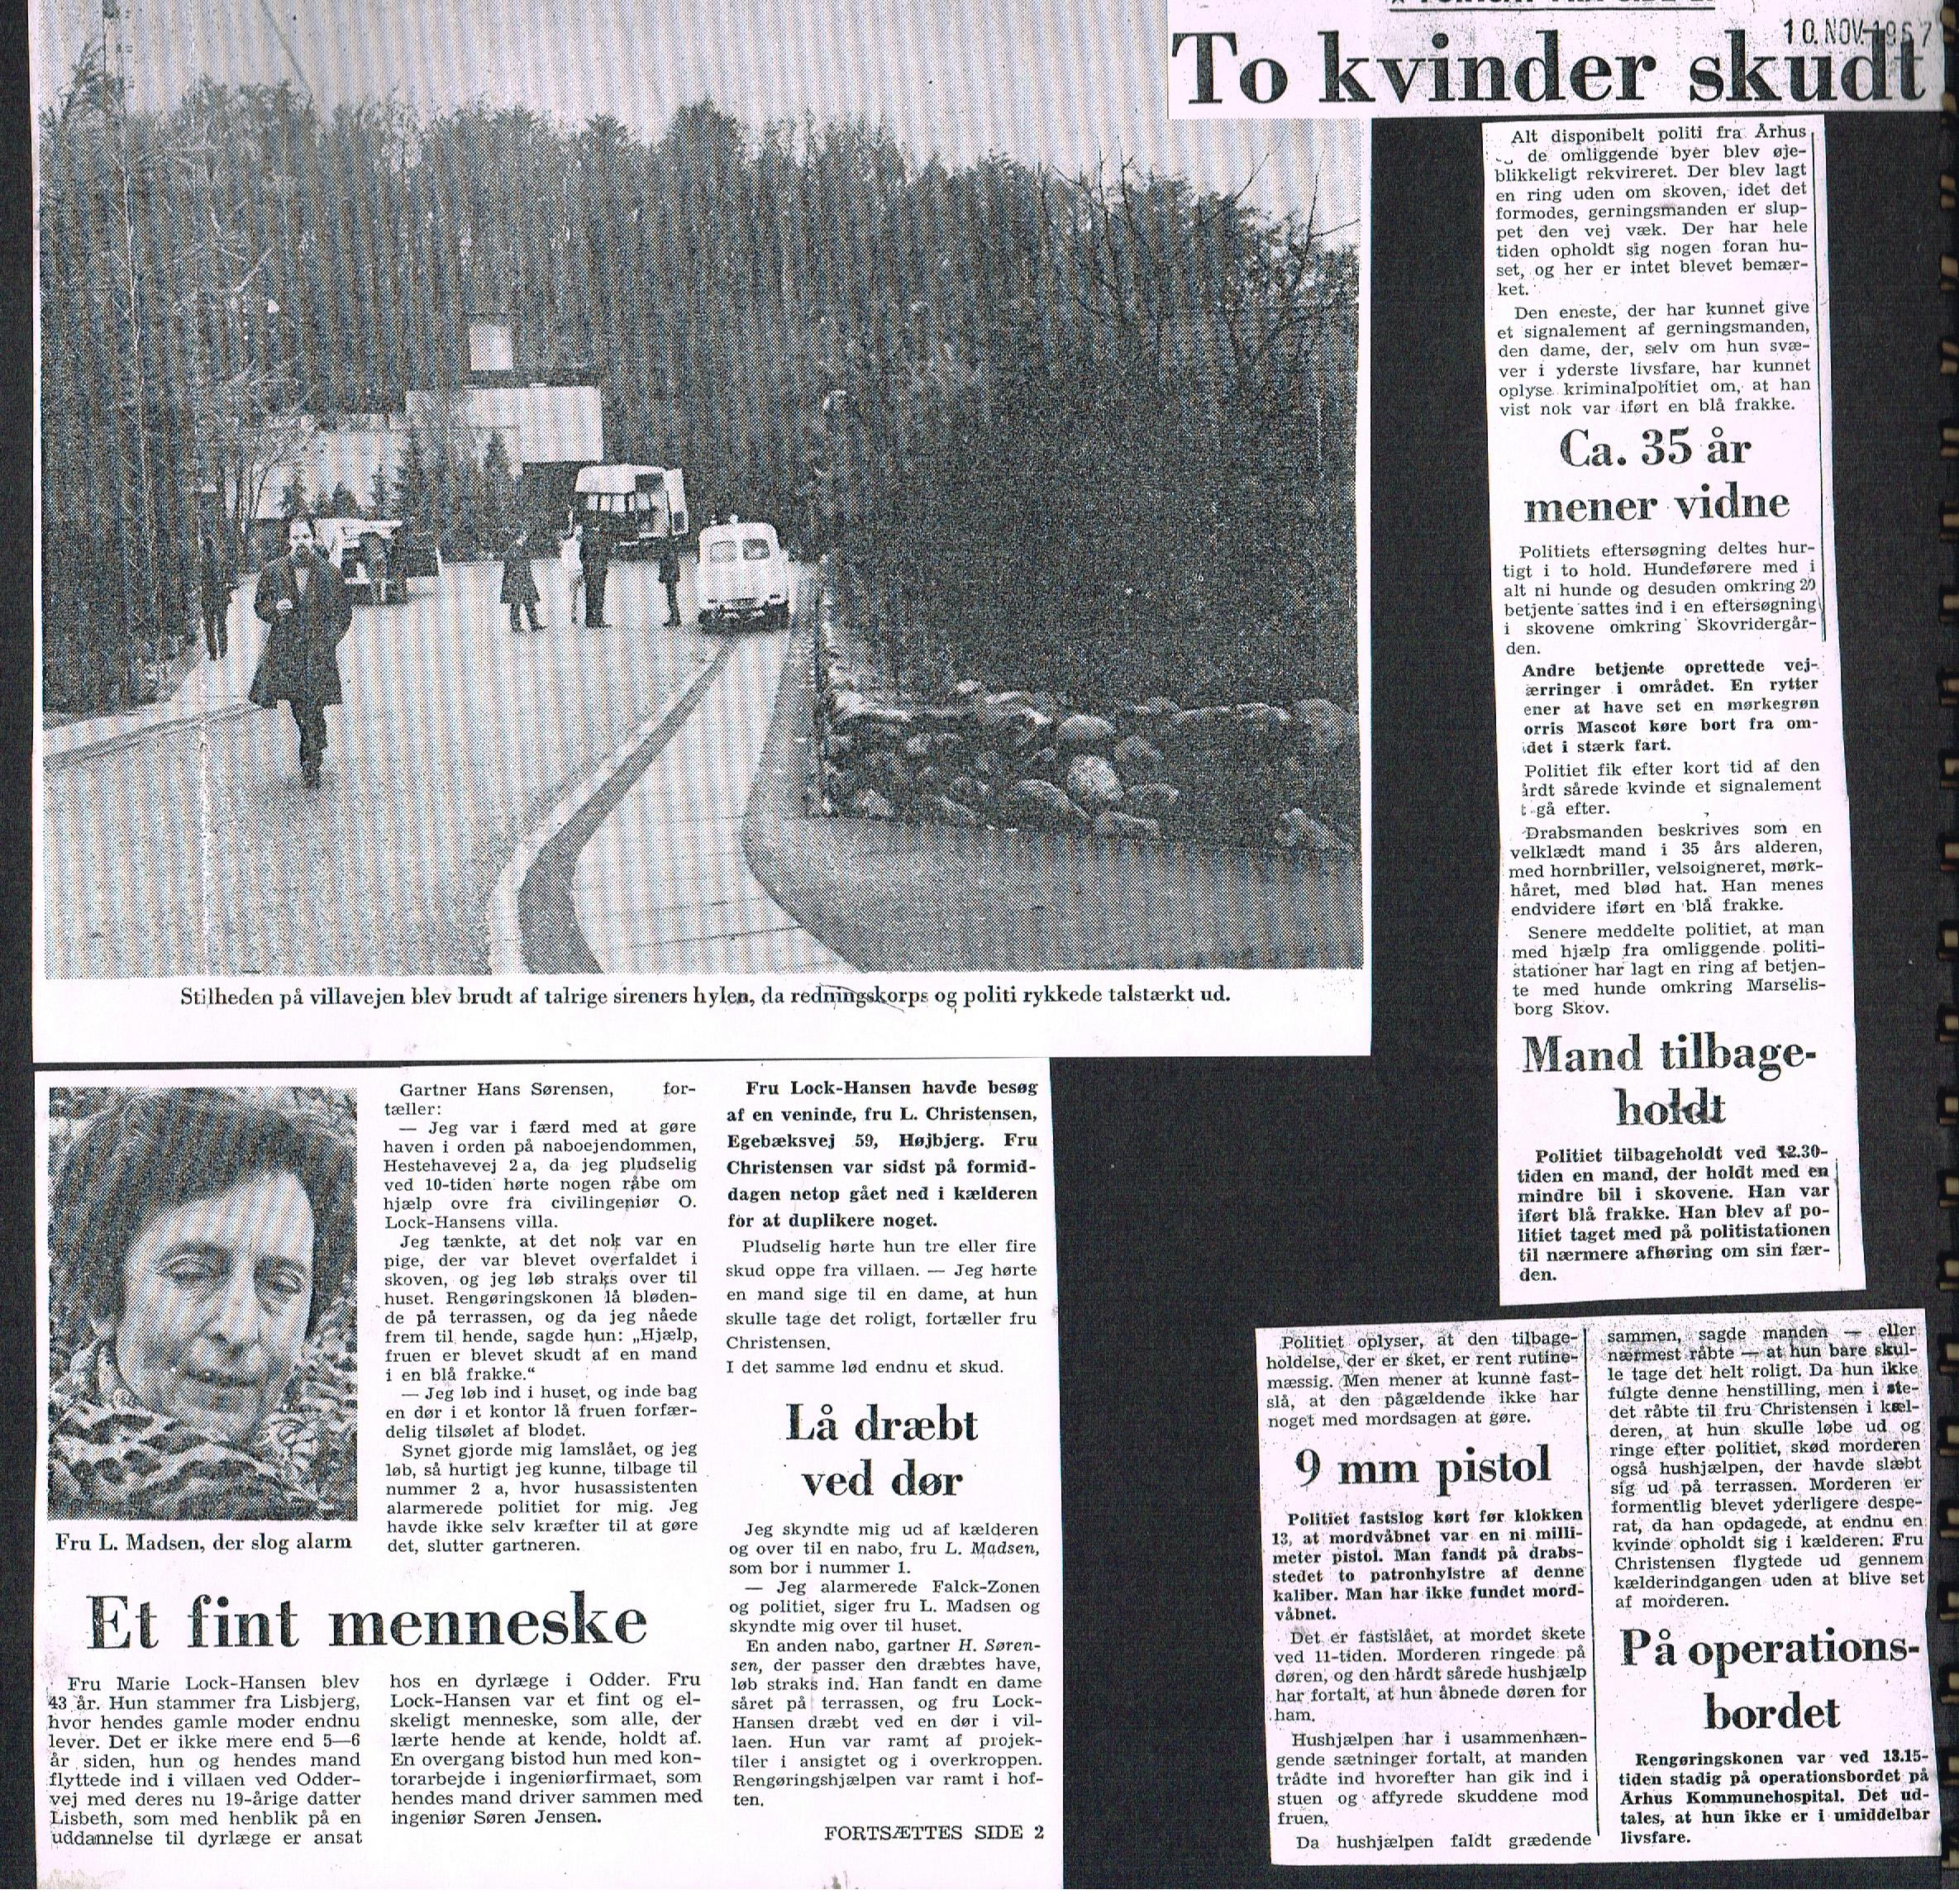 Højbjerg-drabet Aarhus Stiftstidende 10. november 1967.